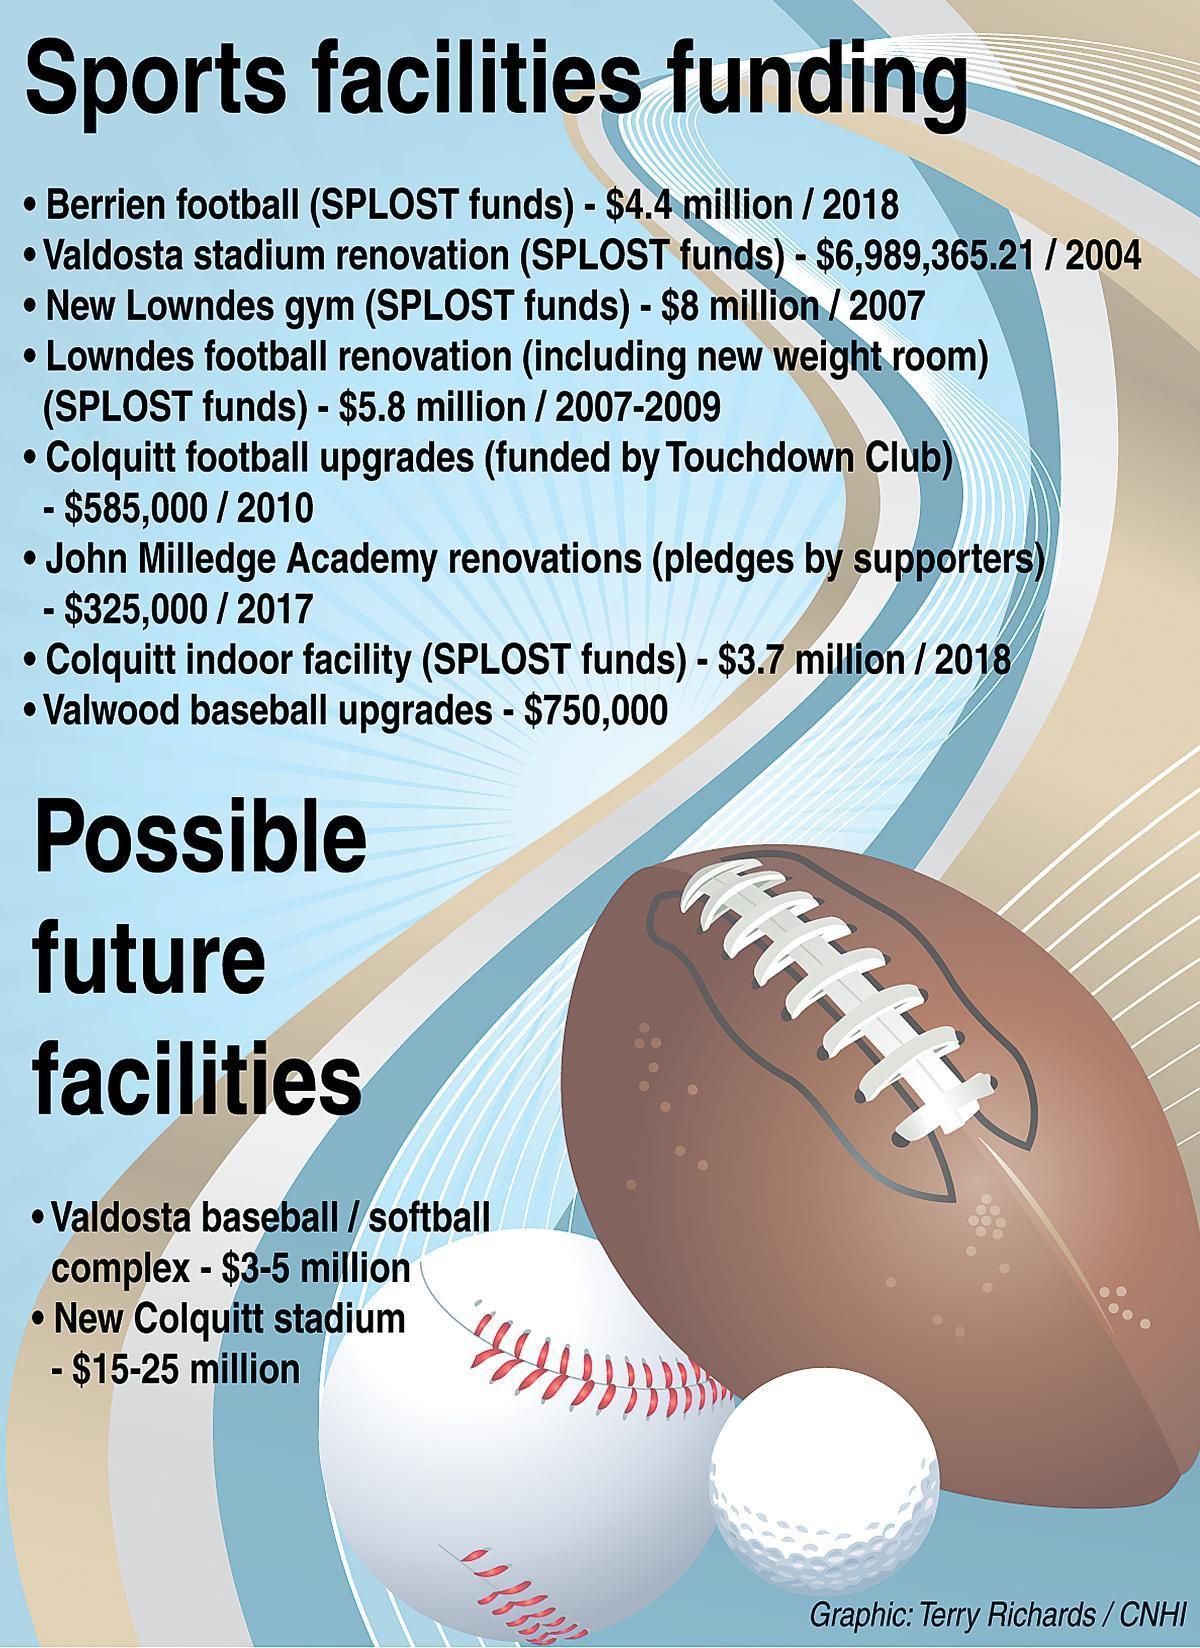 Sports facilities funding